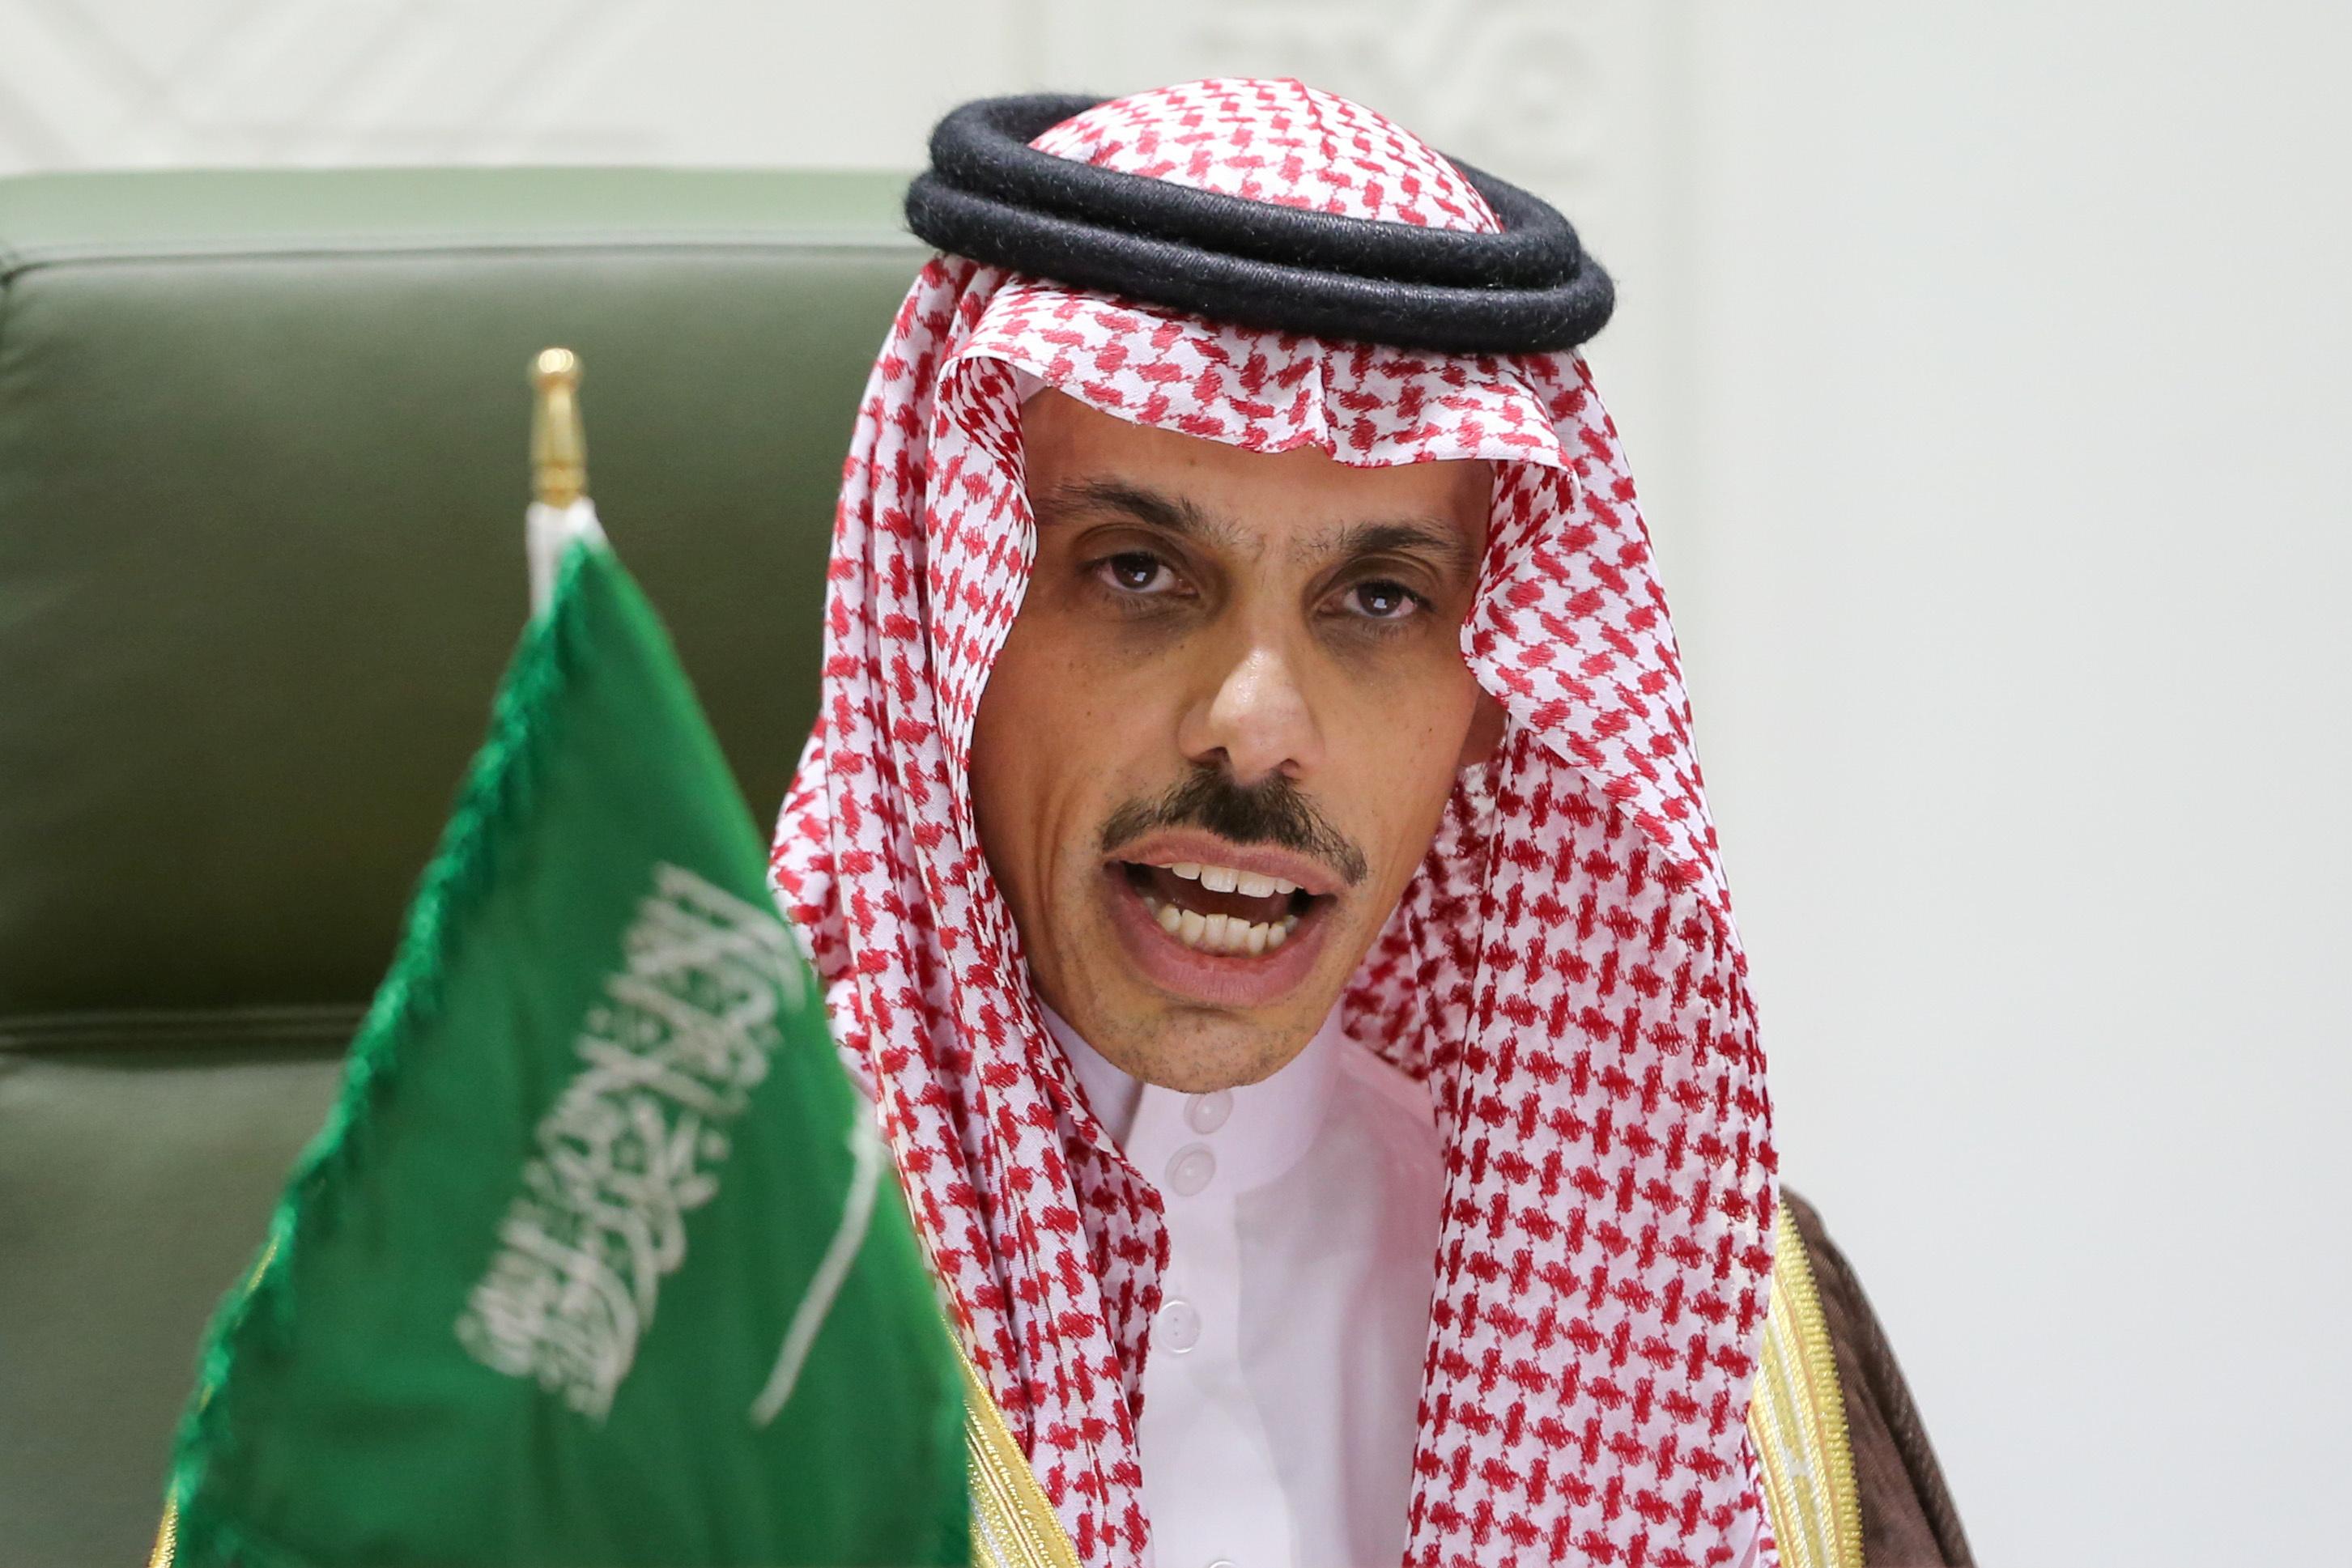 Saudi Arabia's Foreign Minister Prince Faisal bin Farhan Al Saud speaks during a news conference in Riyadh, Saudi Arabia March 22, 2021. REUTERS/Ahmed Yosri